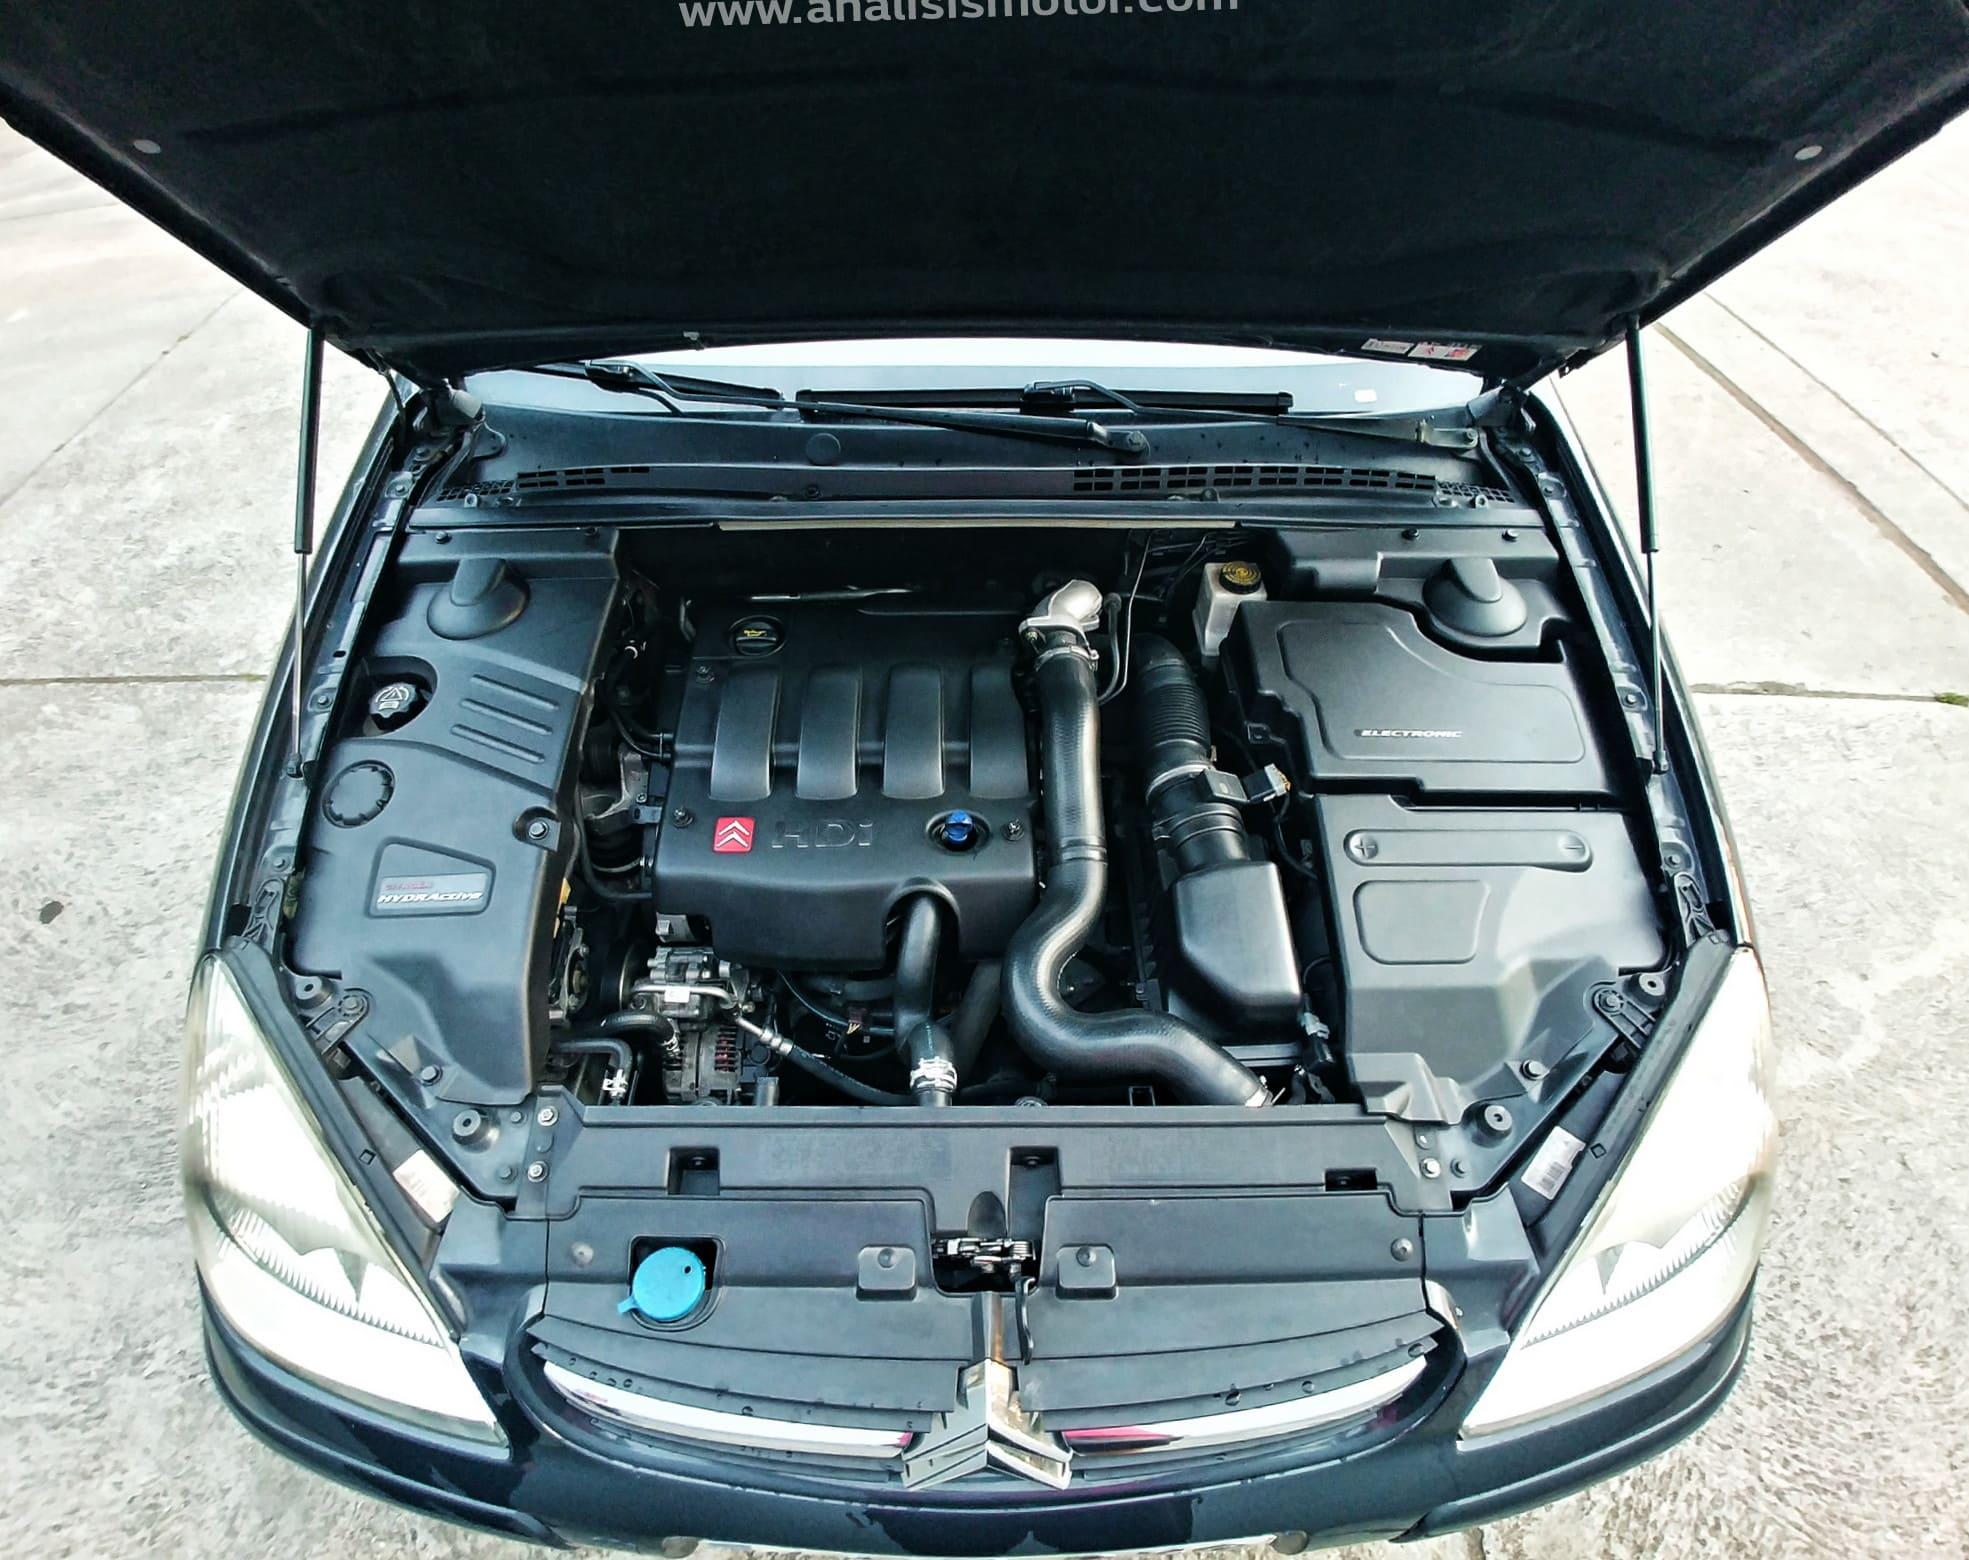 Motor 2.0 HDI 110 Citröen C5